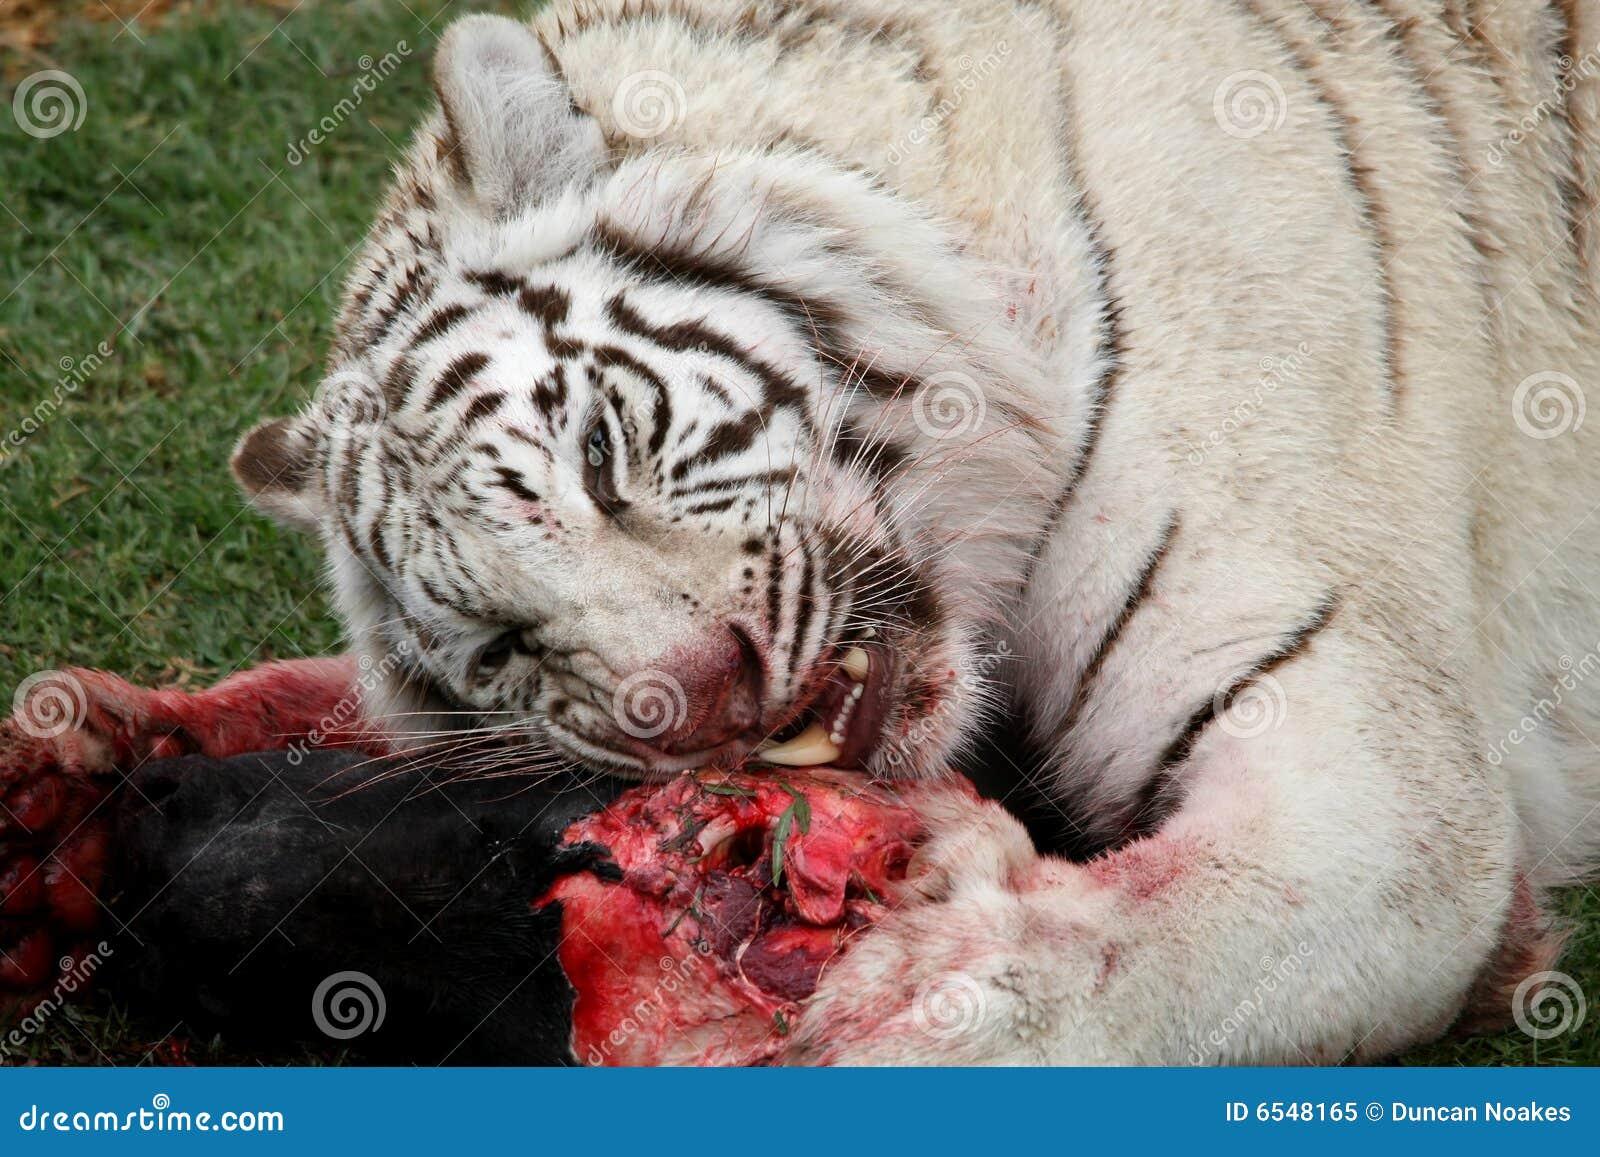 White Tiger Eating